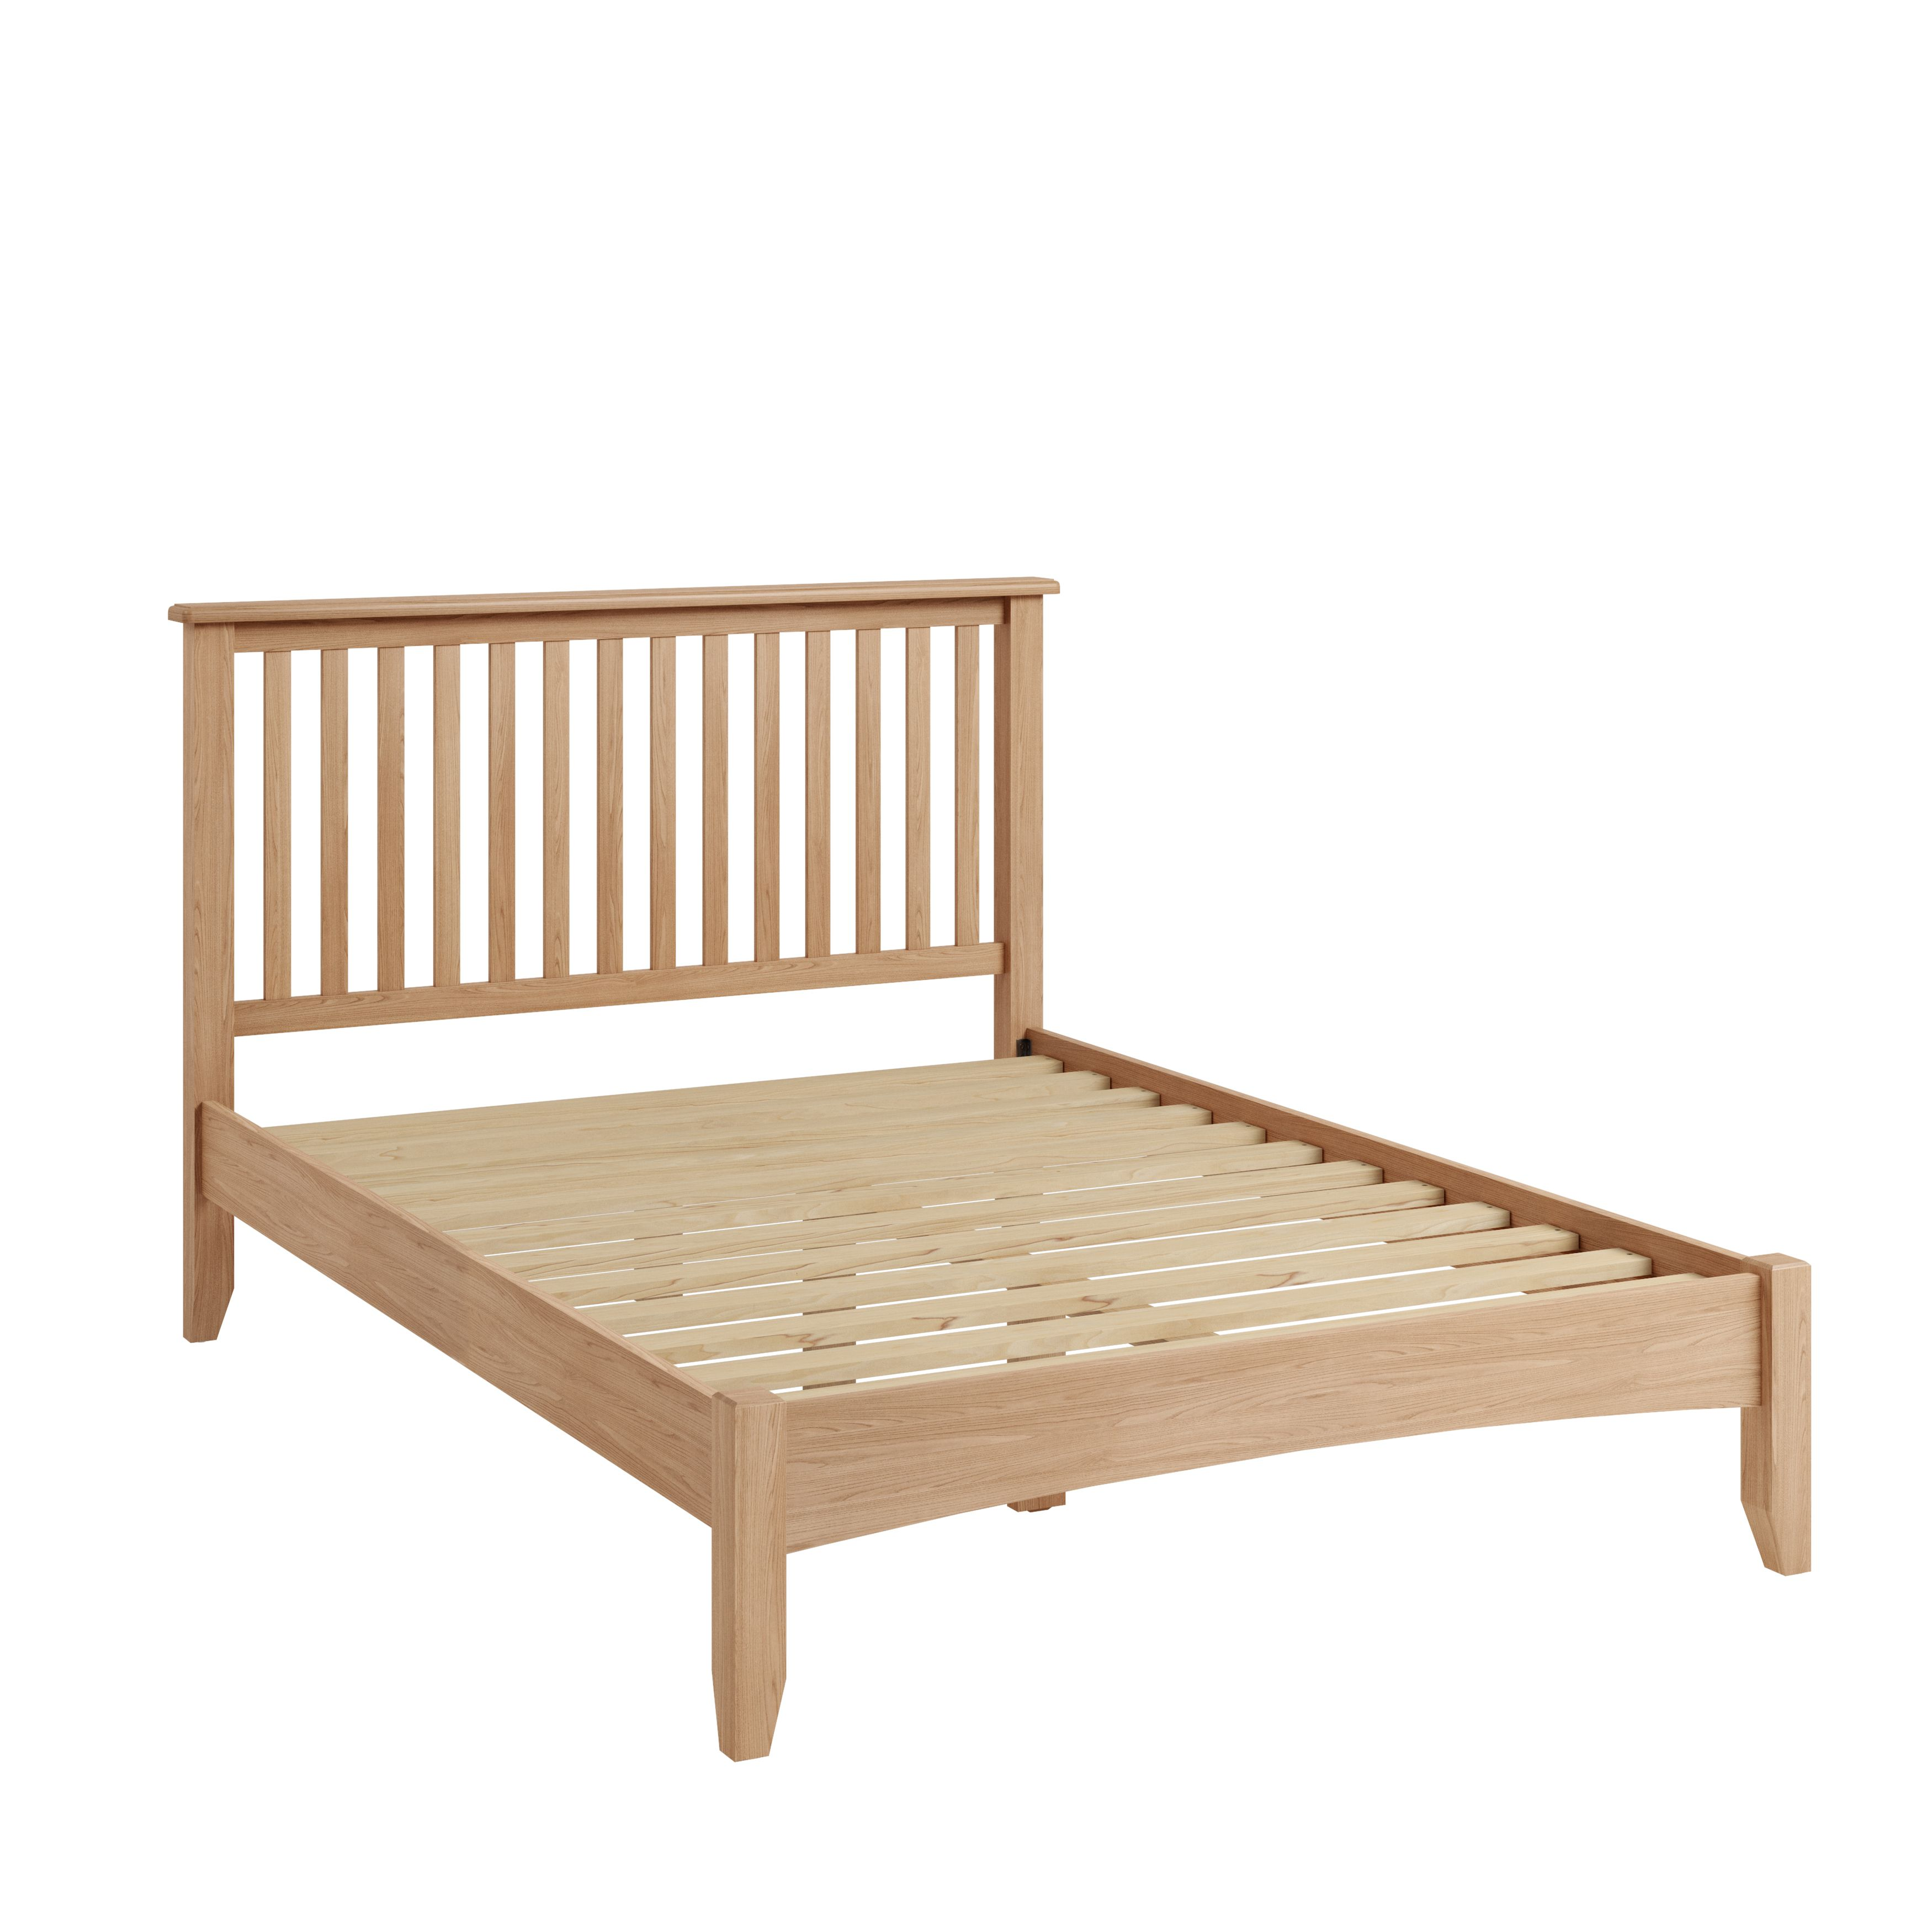 "GARTON 4'6"" Bed"